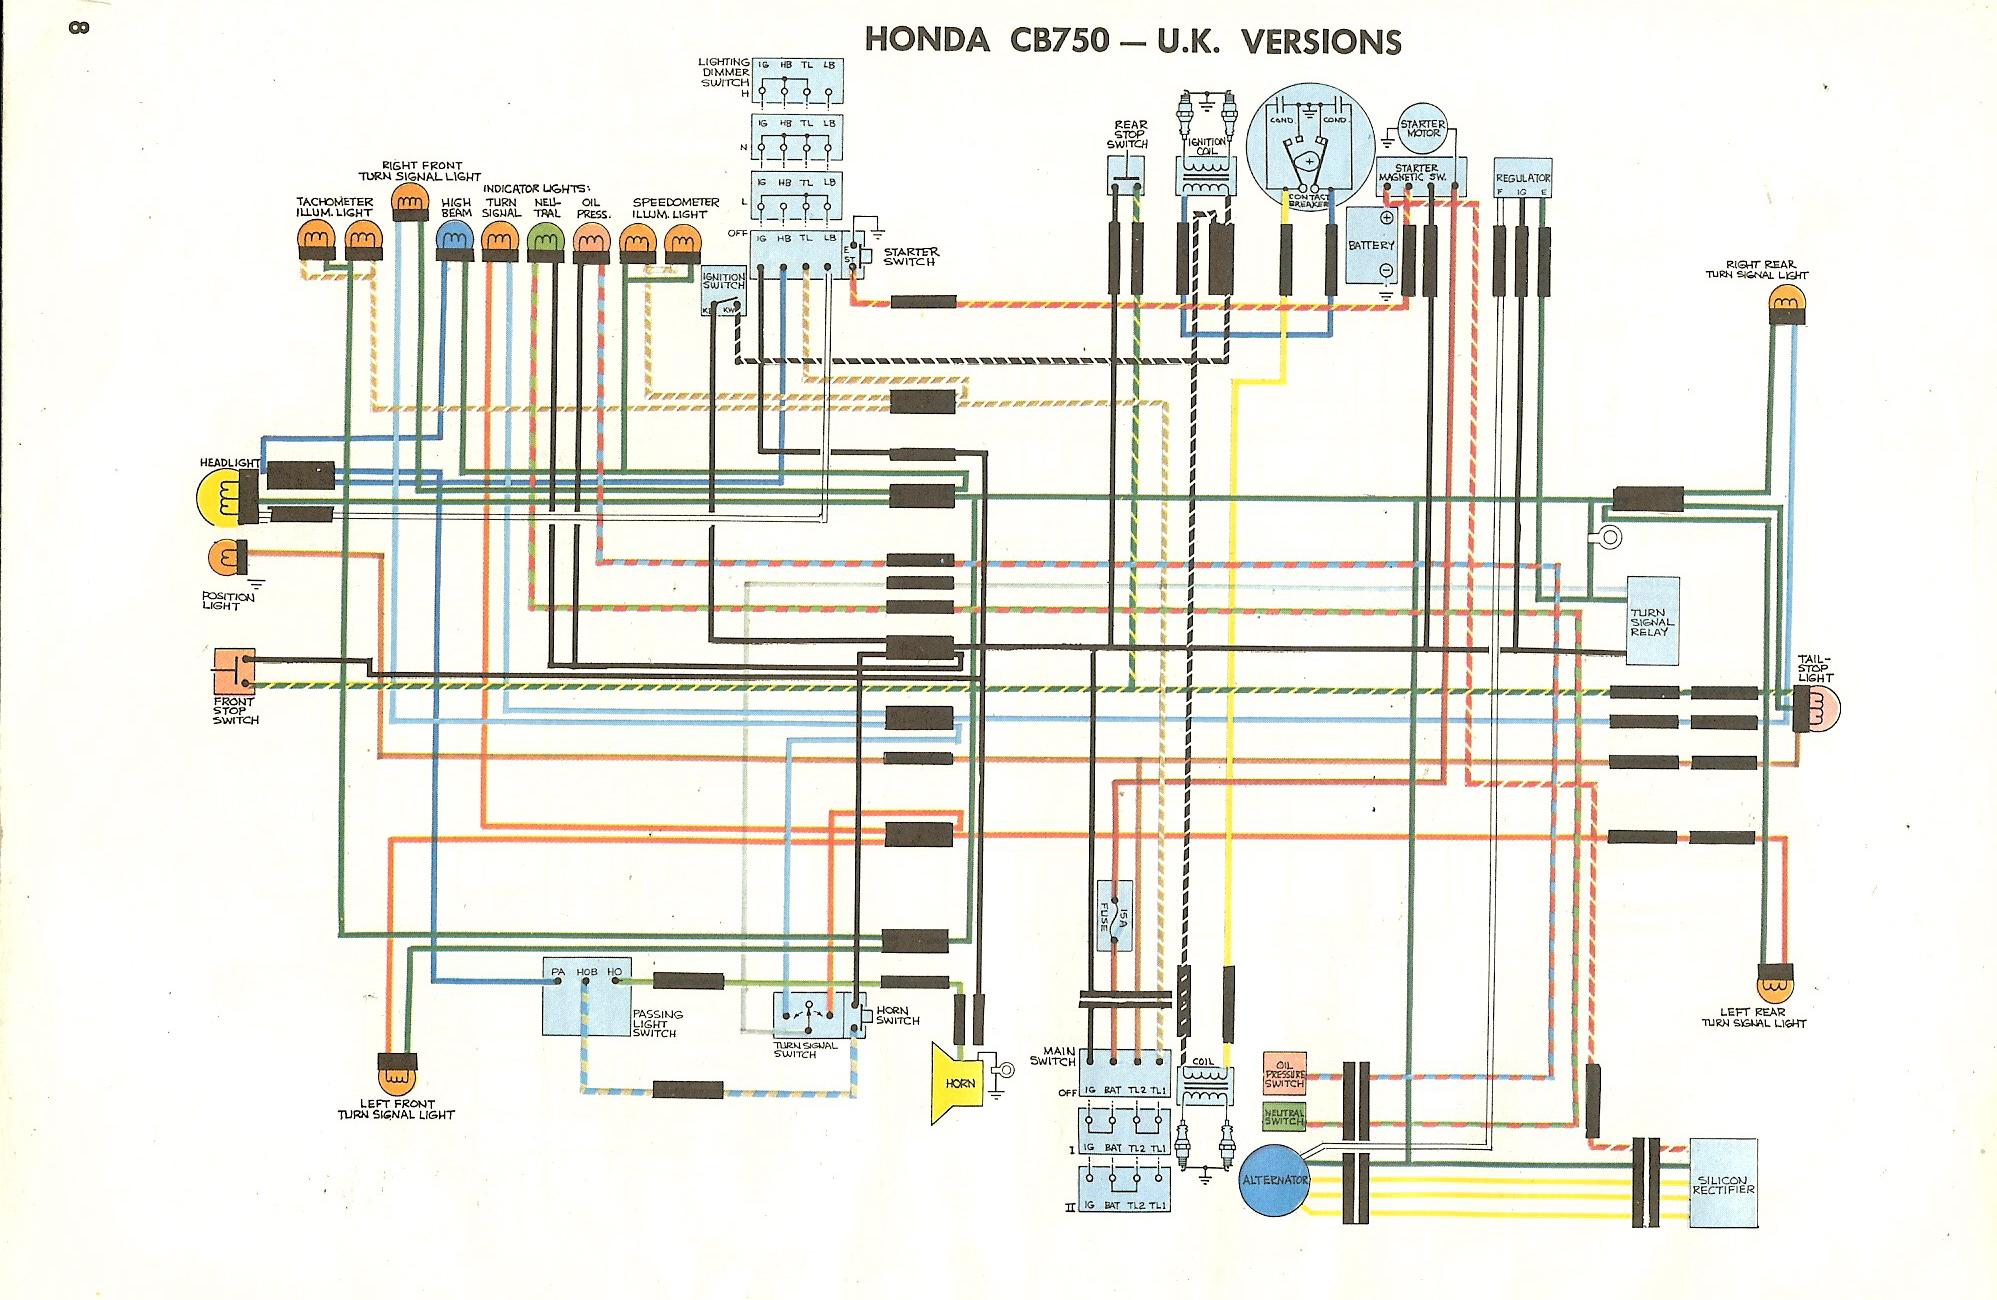 Extraordinary Honda Cb200 Simple Wiring Diagram Photos - Best Image ...